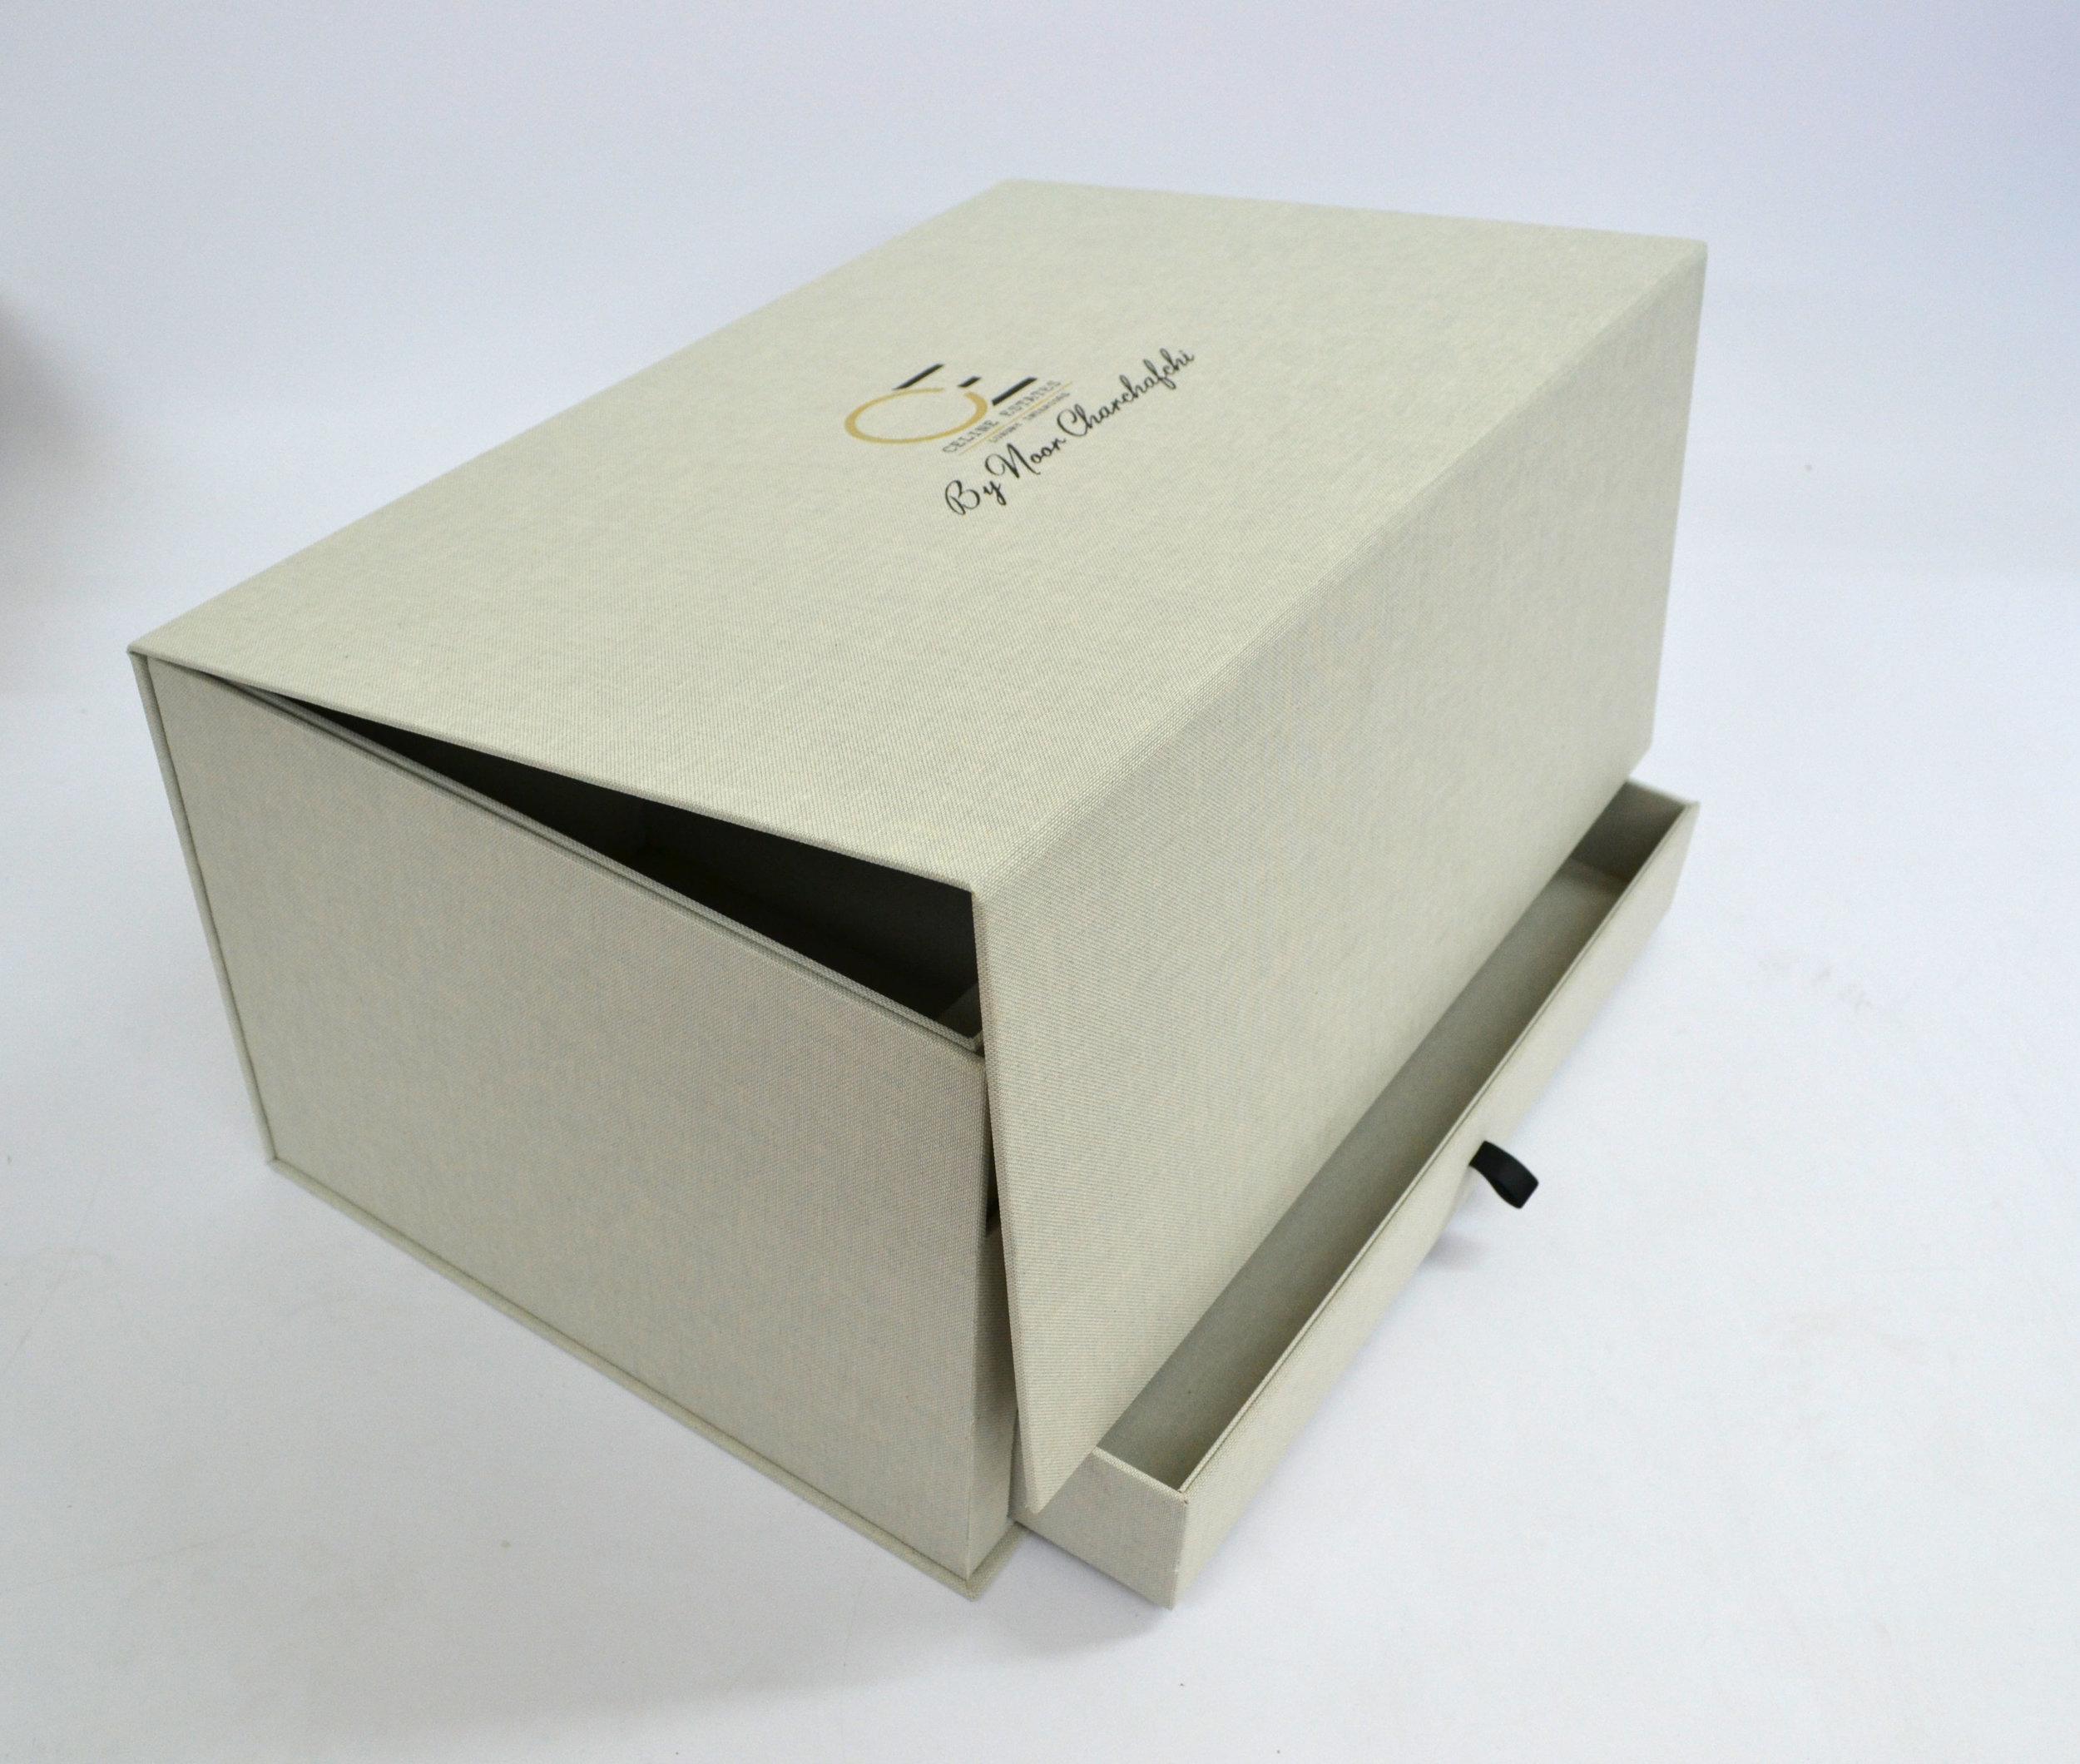 Luxury presentation box